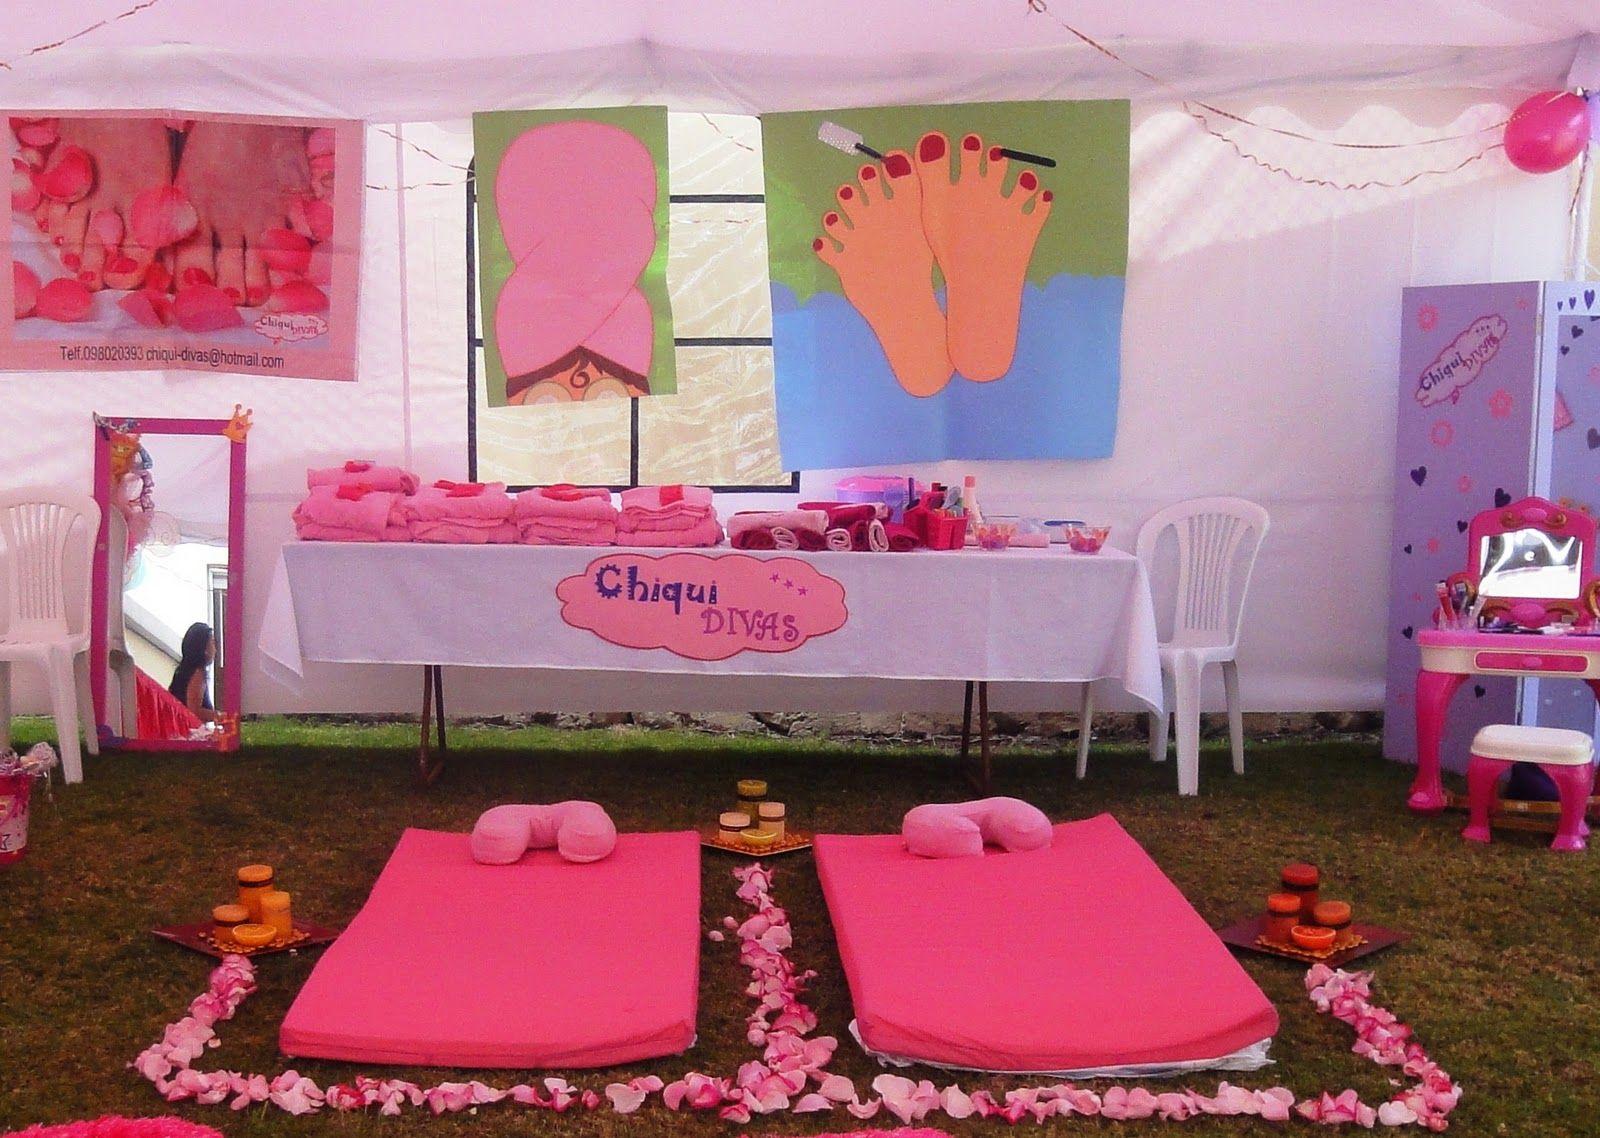 Decoration De Spa dedans ideas para celebrar una fiesta spa para niñas   fiestas kids   salon